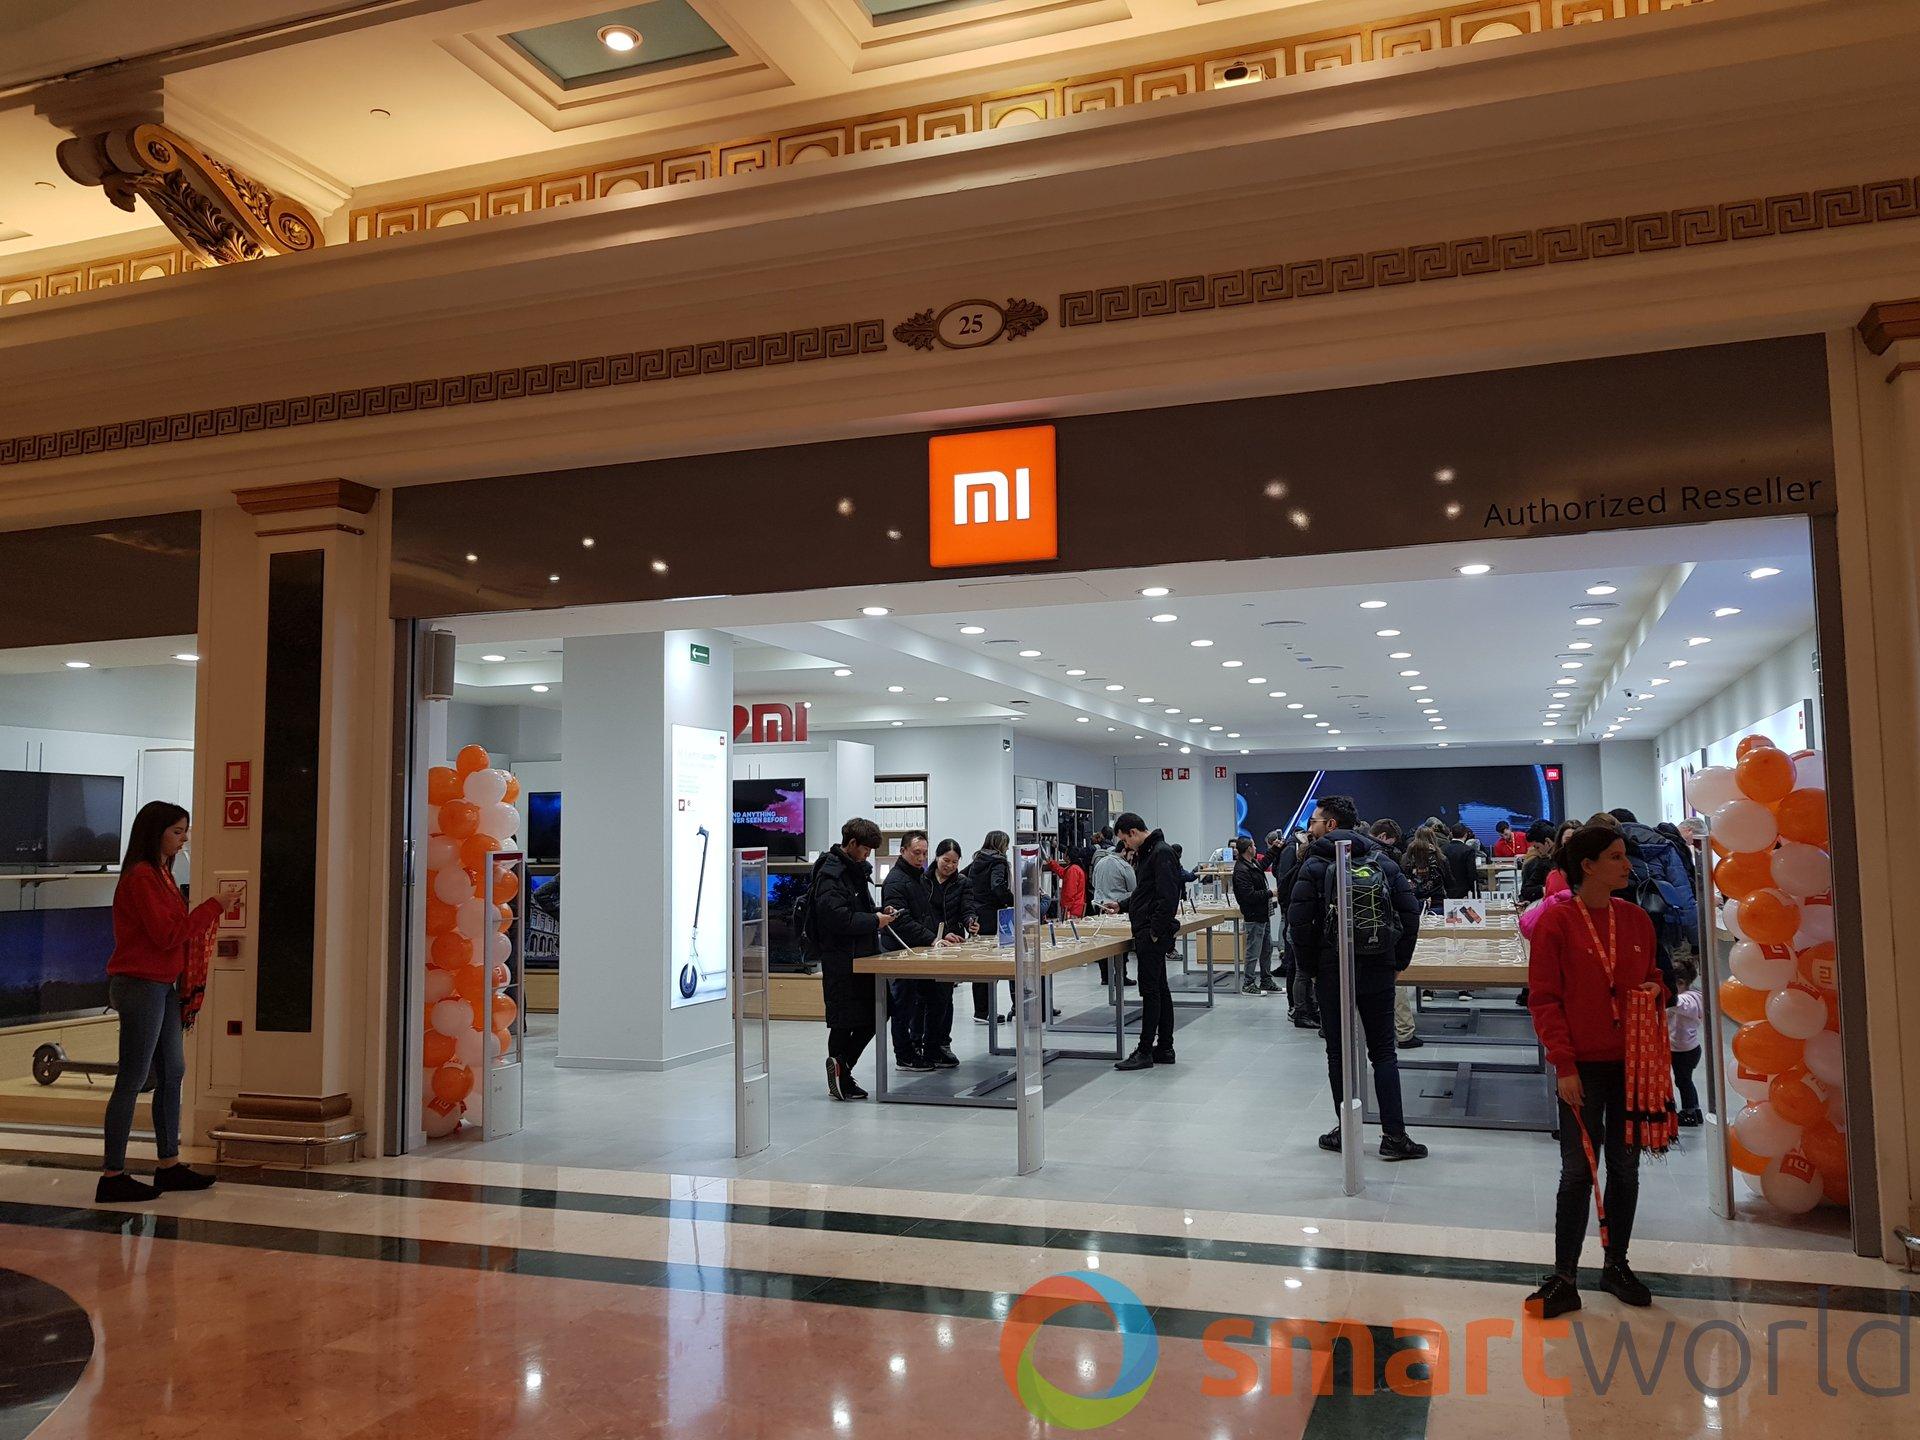 JoyUI 11, l'interfaccia Xiaomi per Black Shark dedicata al gaming - image xiaomi-mi-store-1 on https://www.zxbyte.com